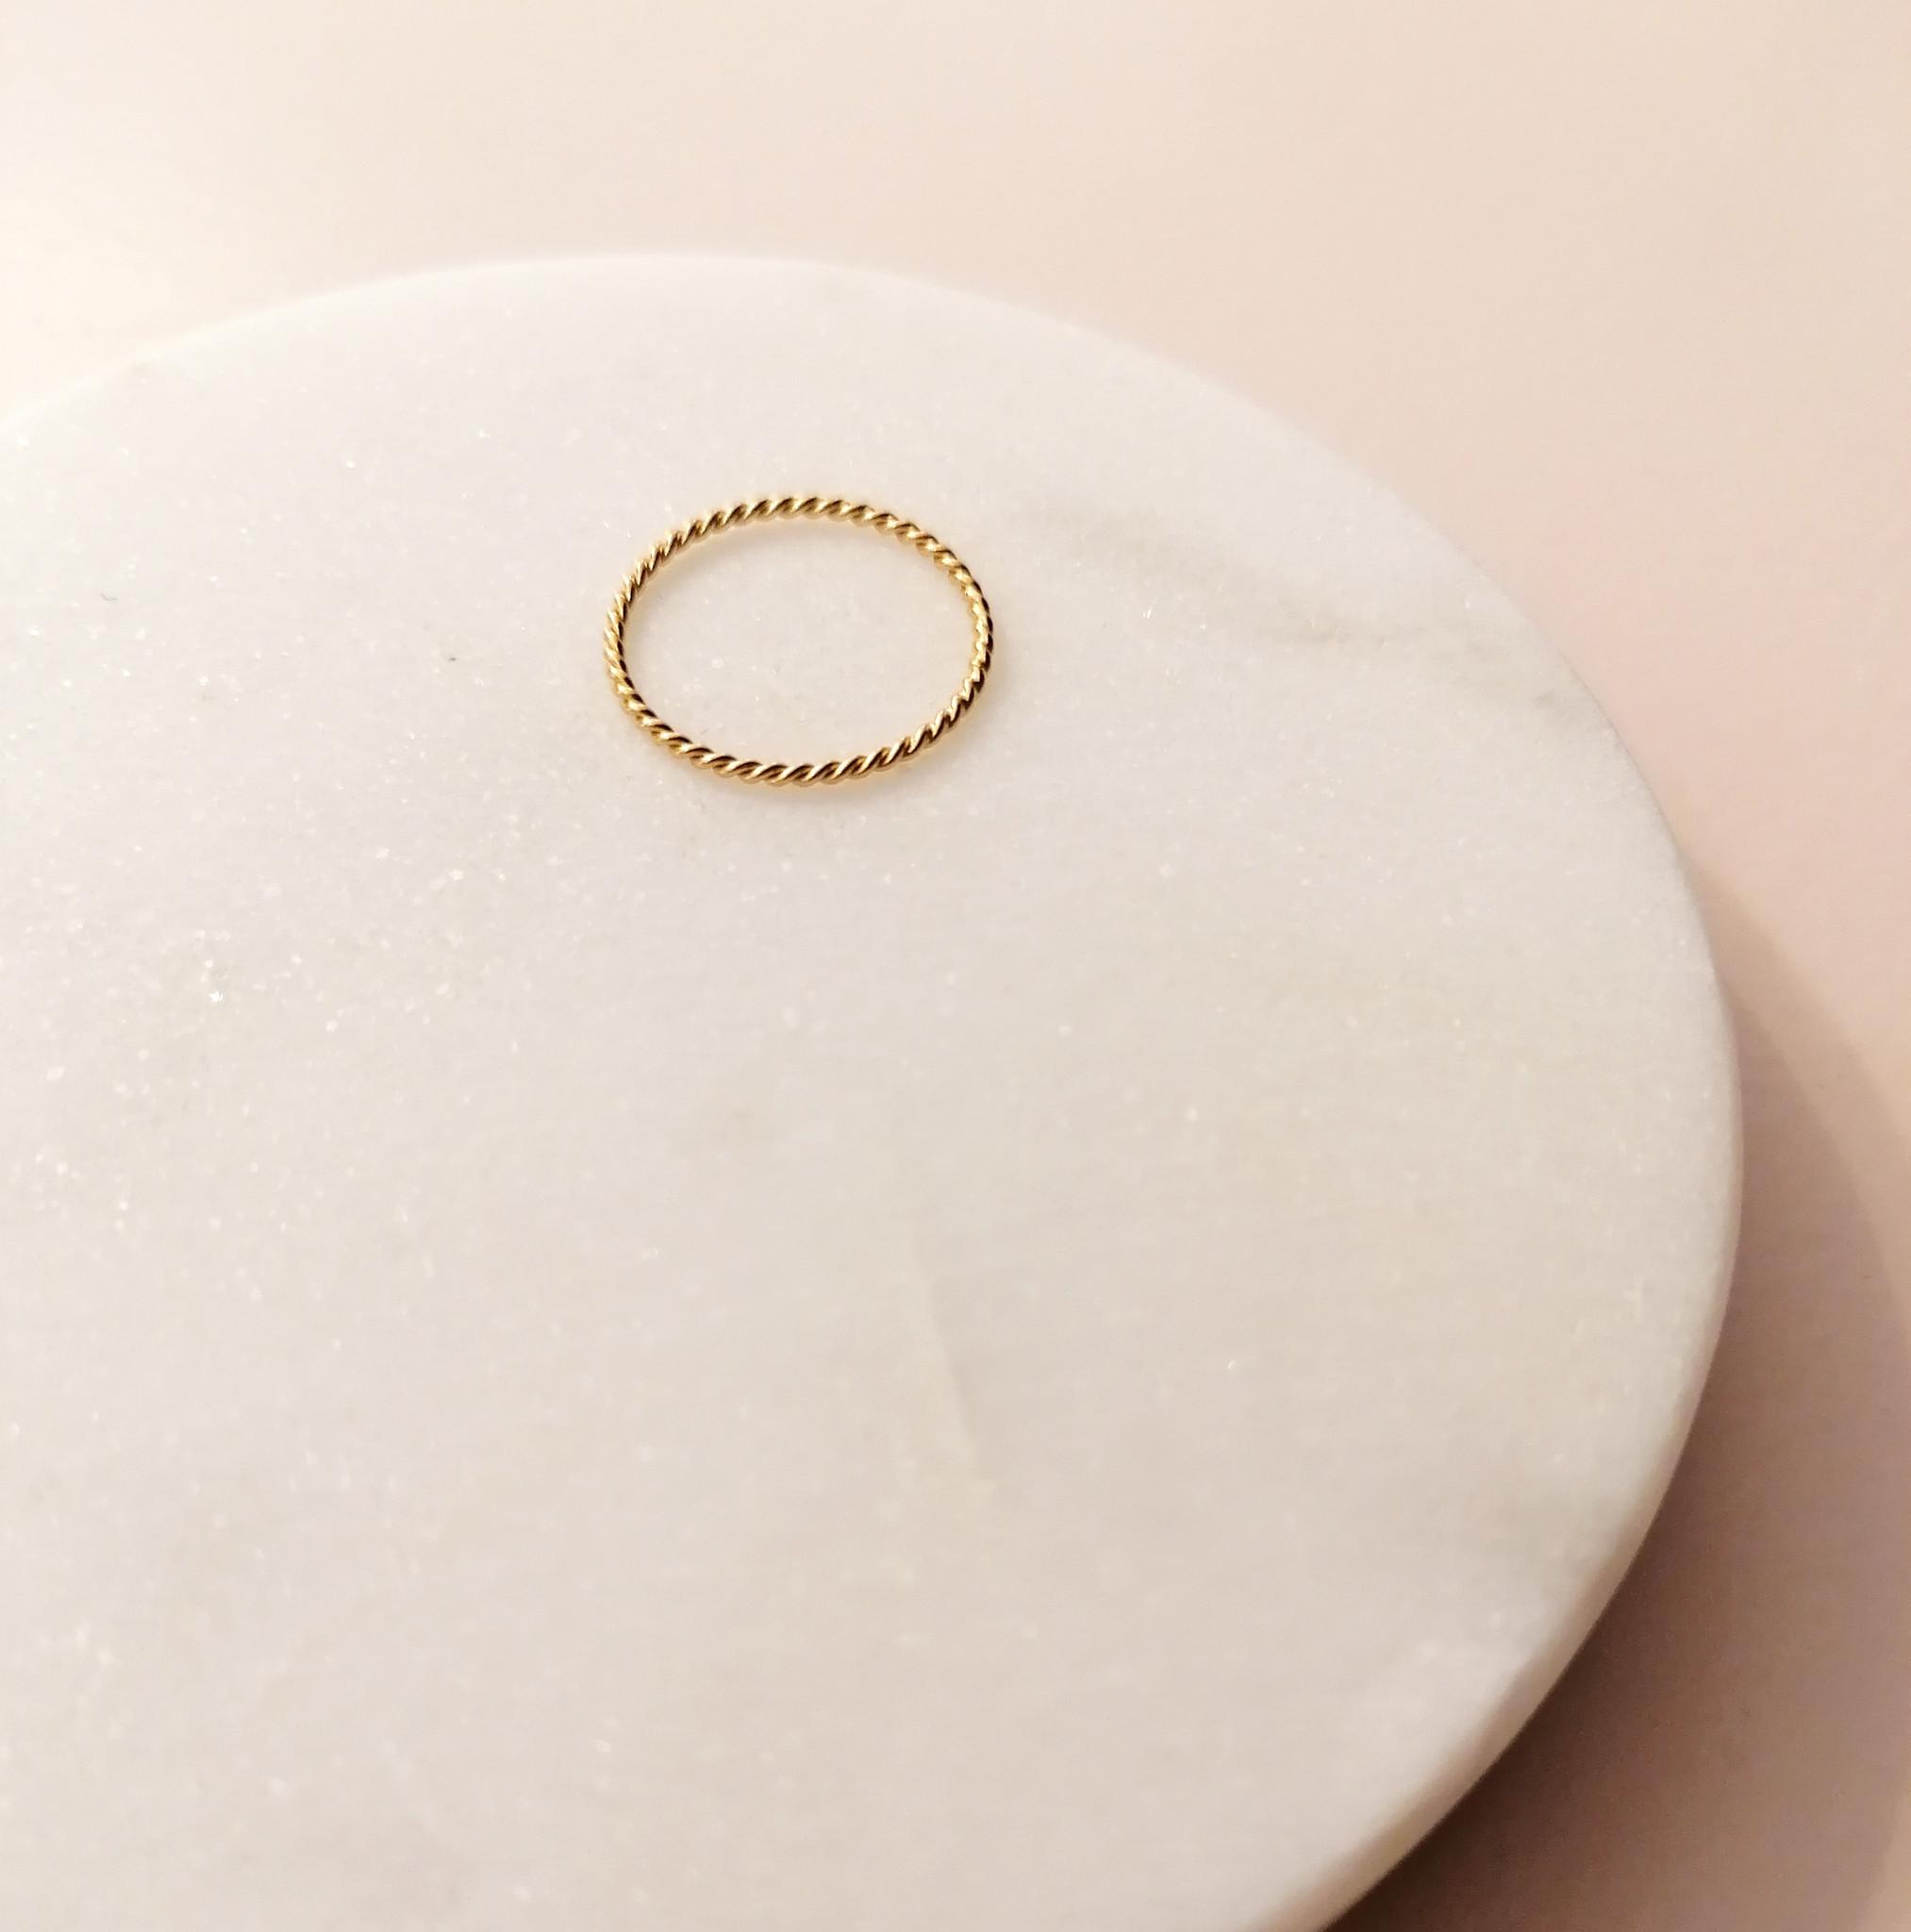 Fein geflochtener Ring aus 925er Sterling Silber - Gold-3